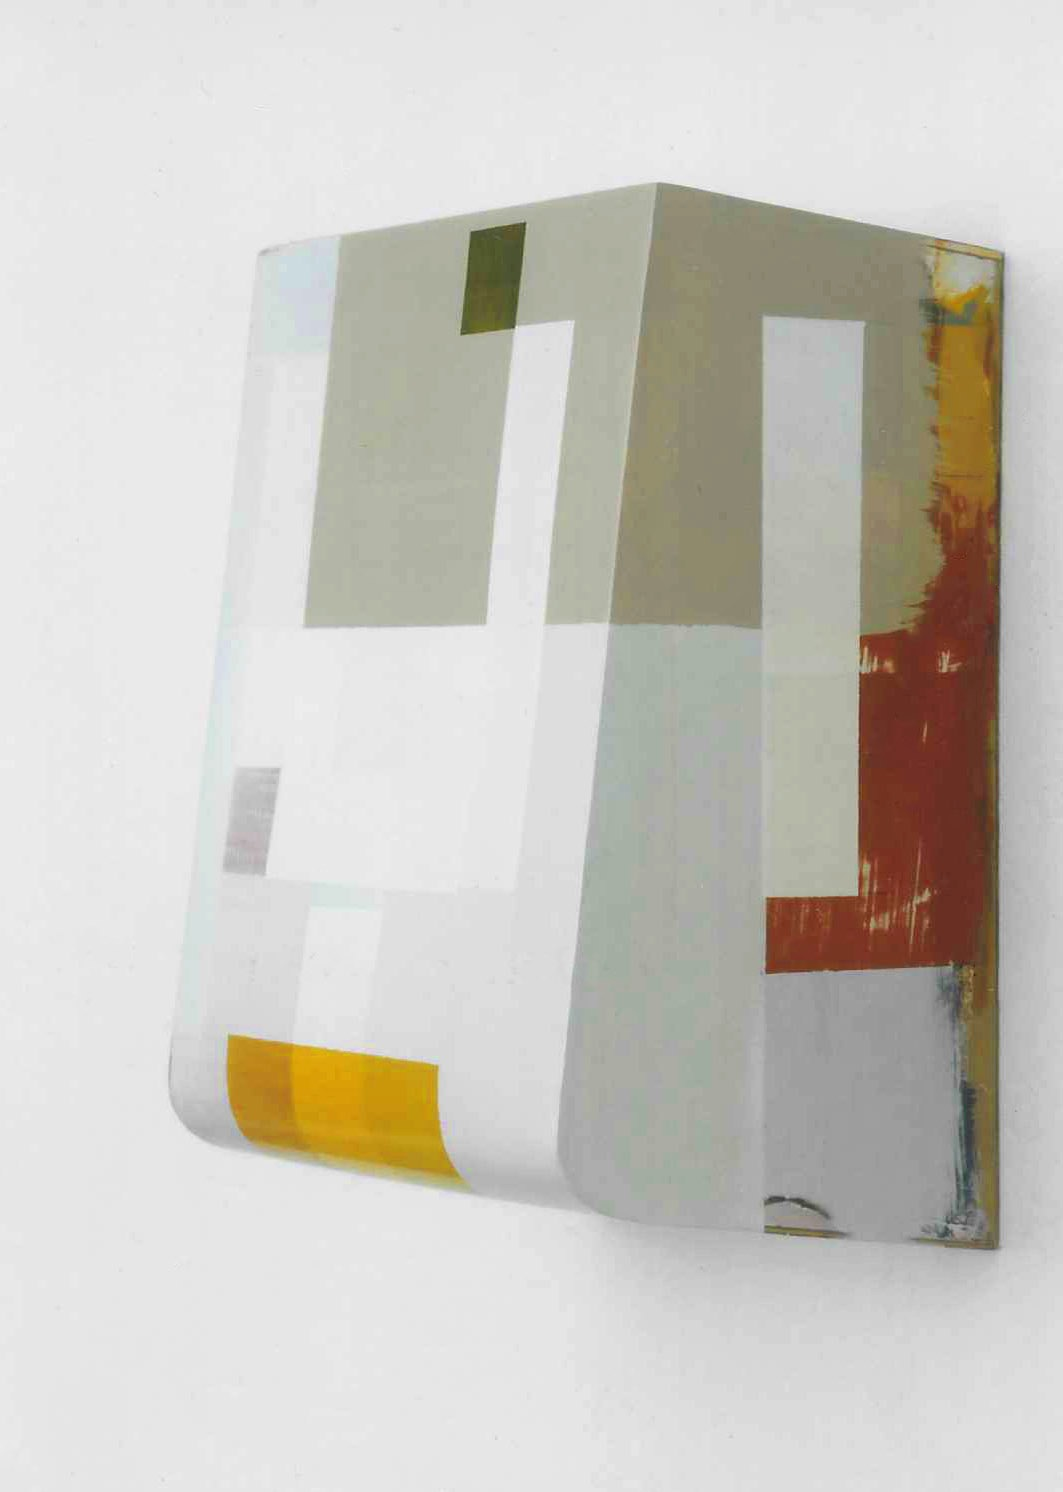 """Kunst ist kostbar"", Acrylfarbe, Holz, 42x33x21 cm, 1994"